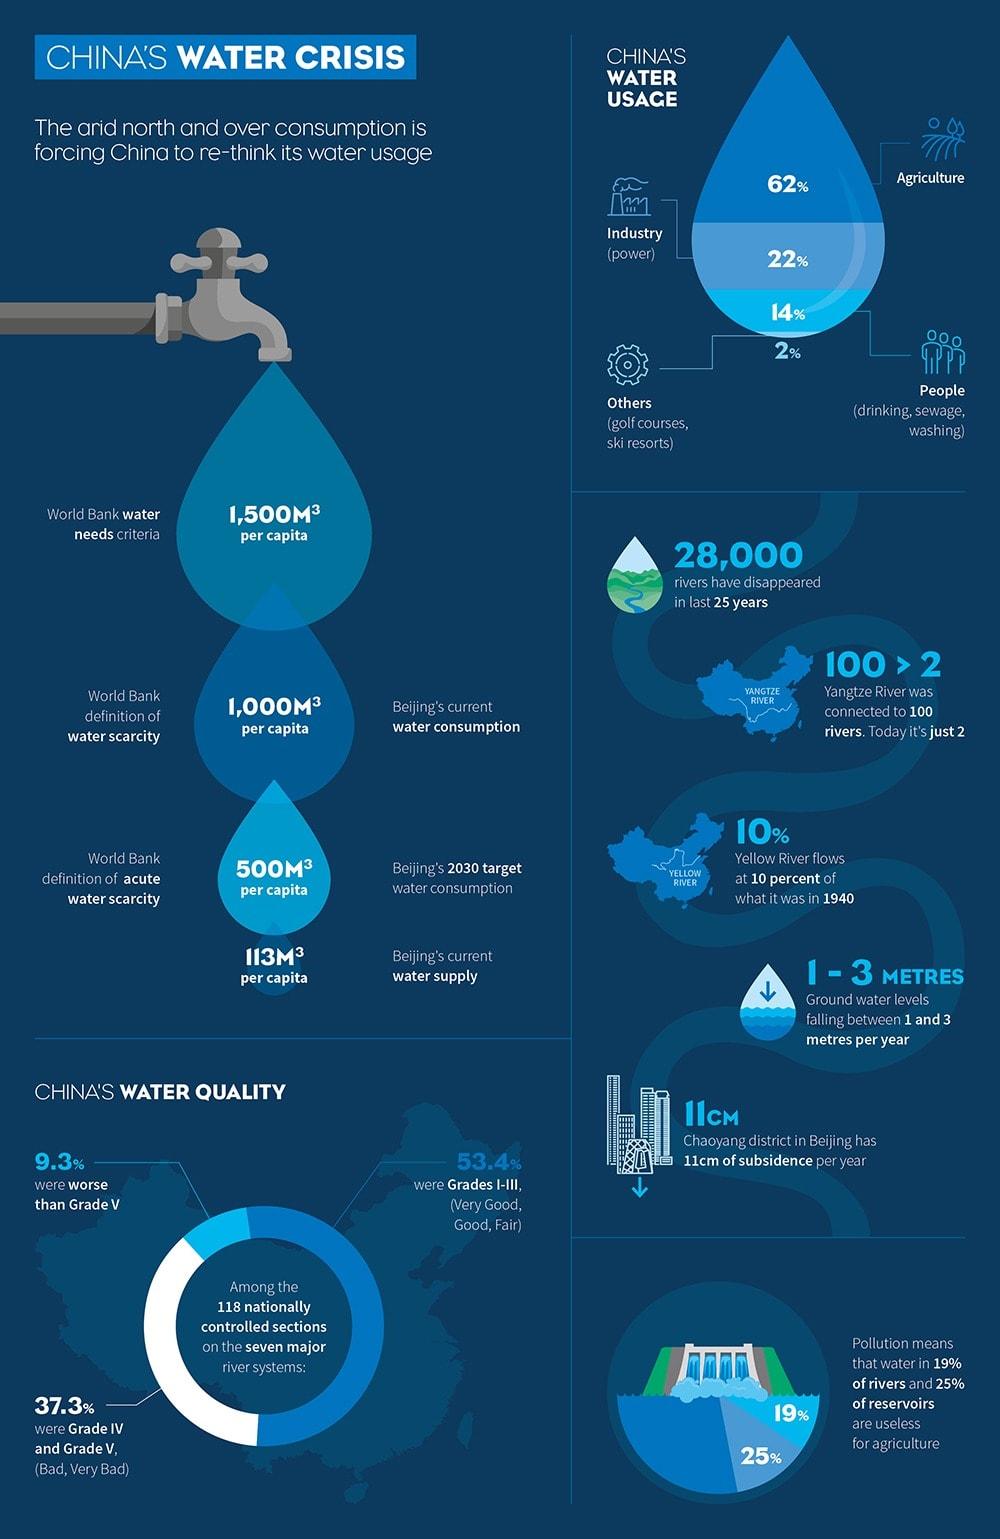 China Water Use